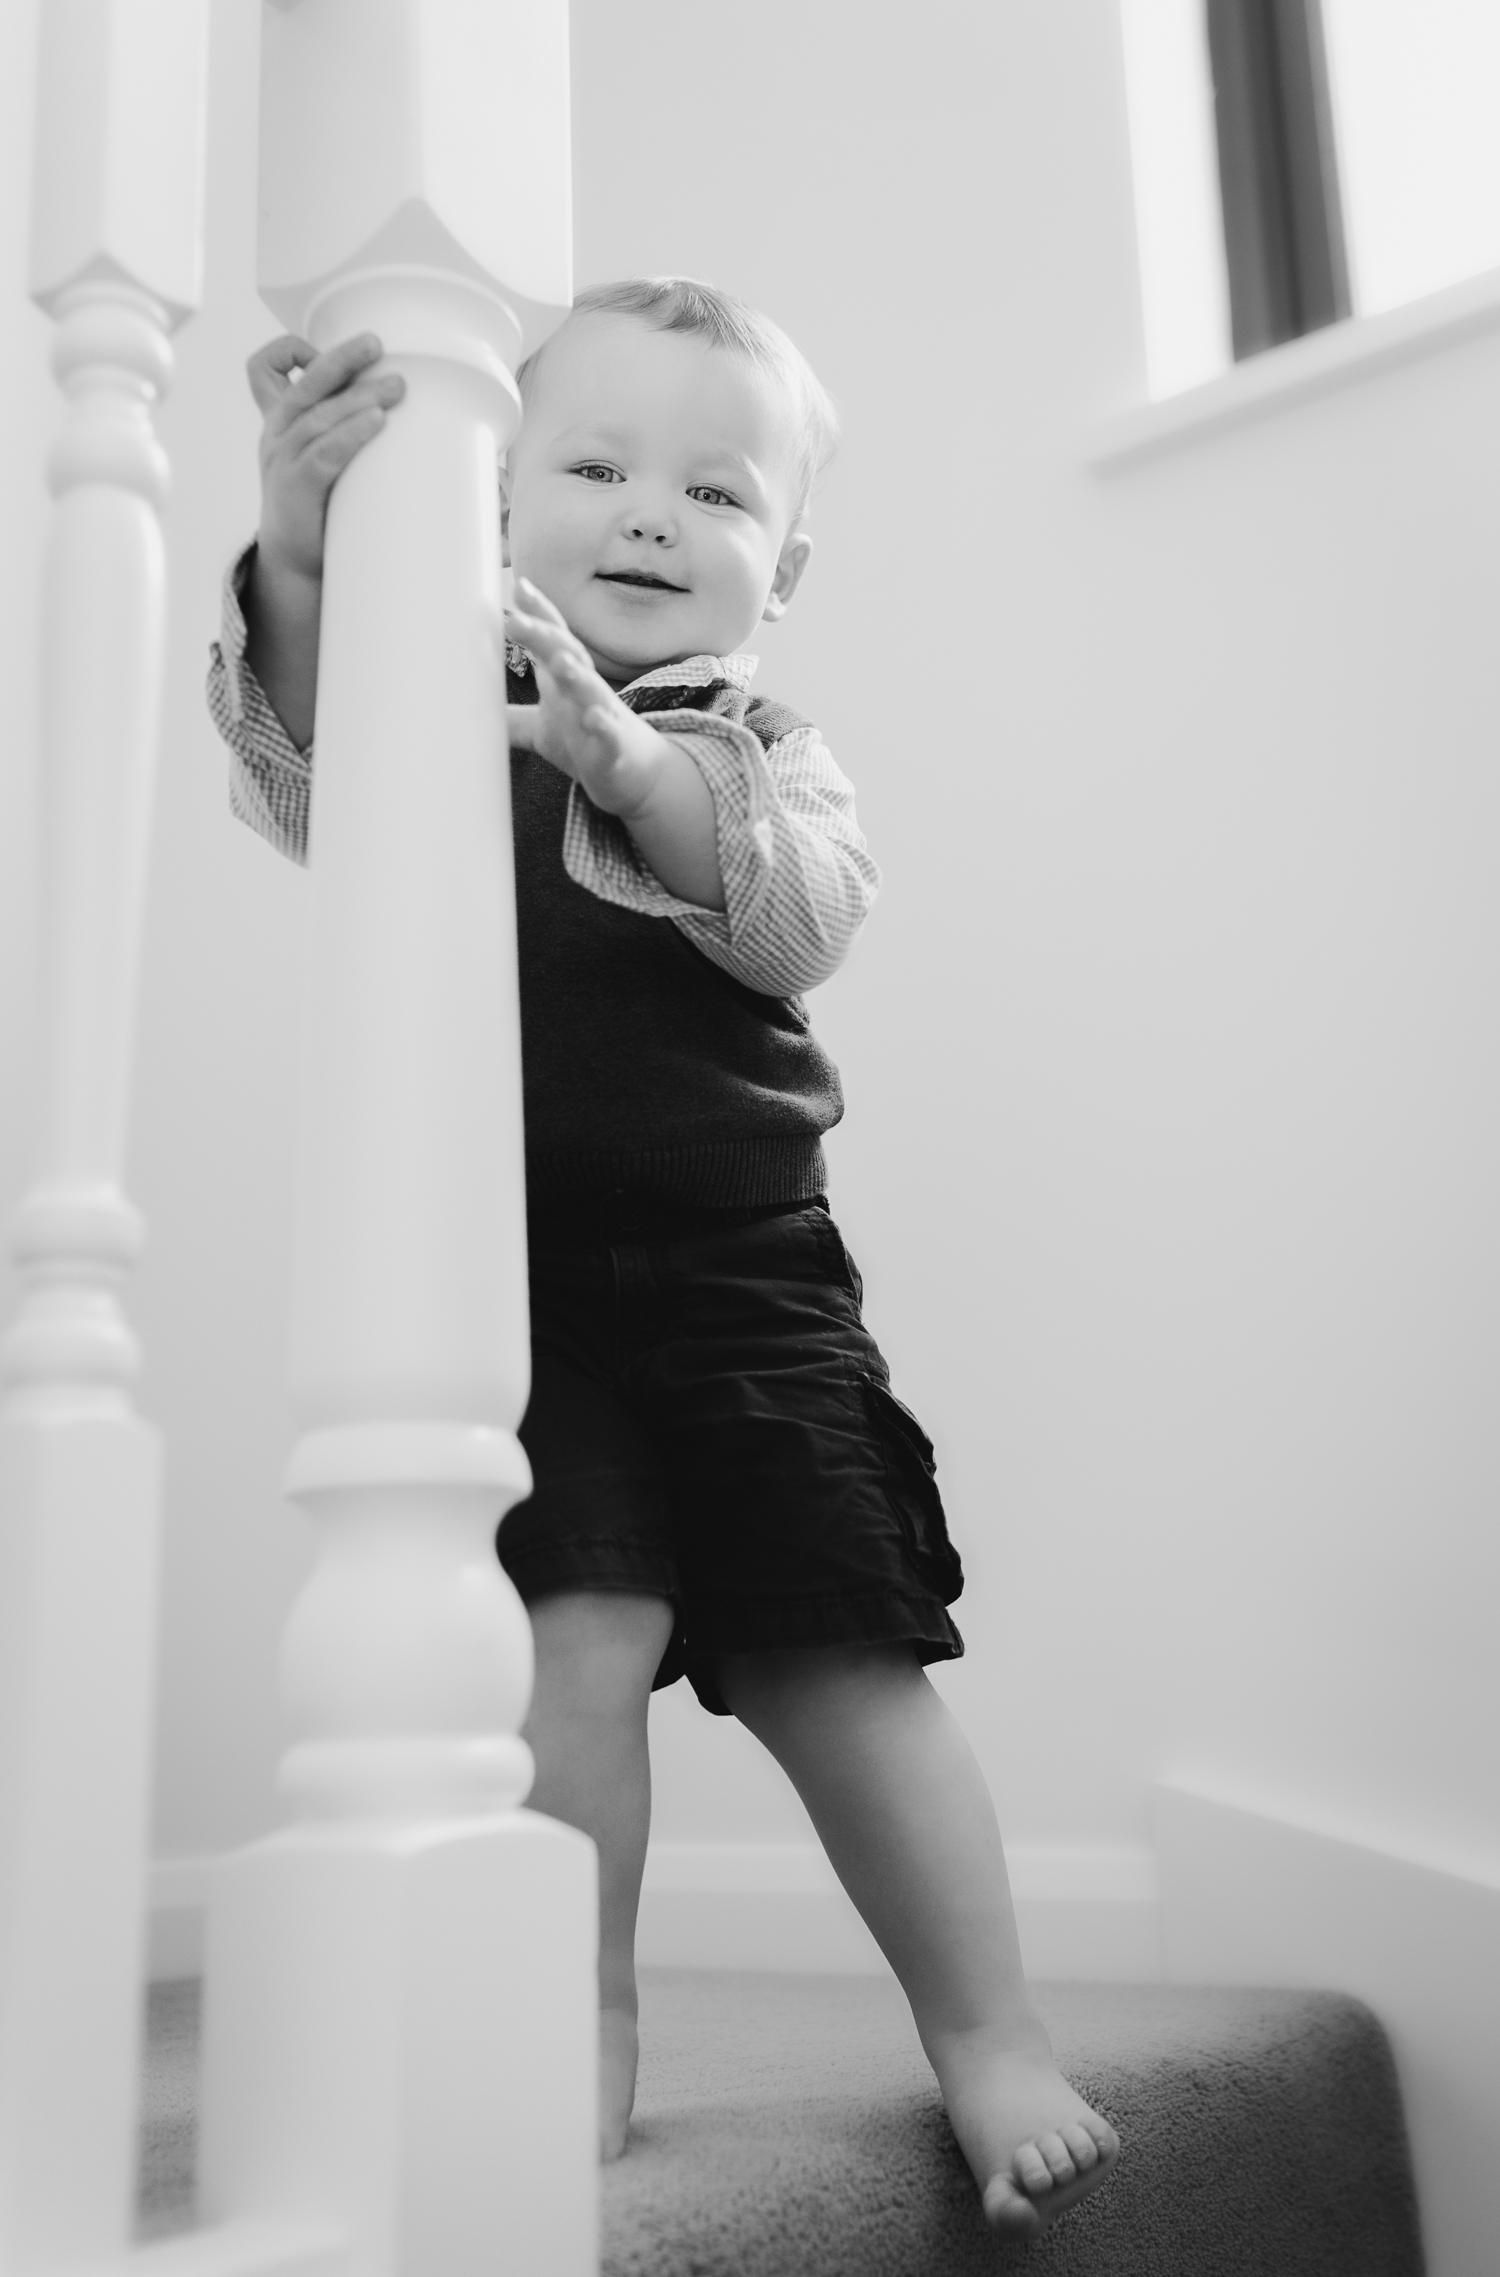 Children's Photographer in Woking